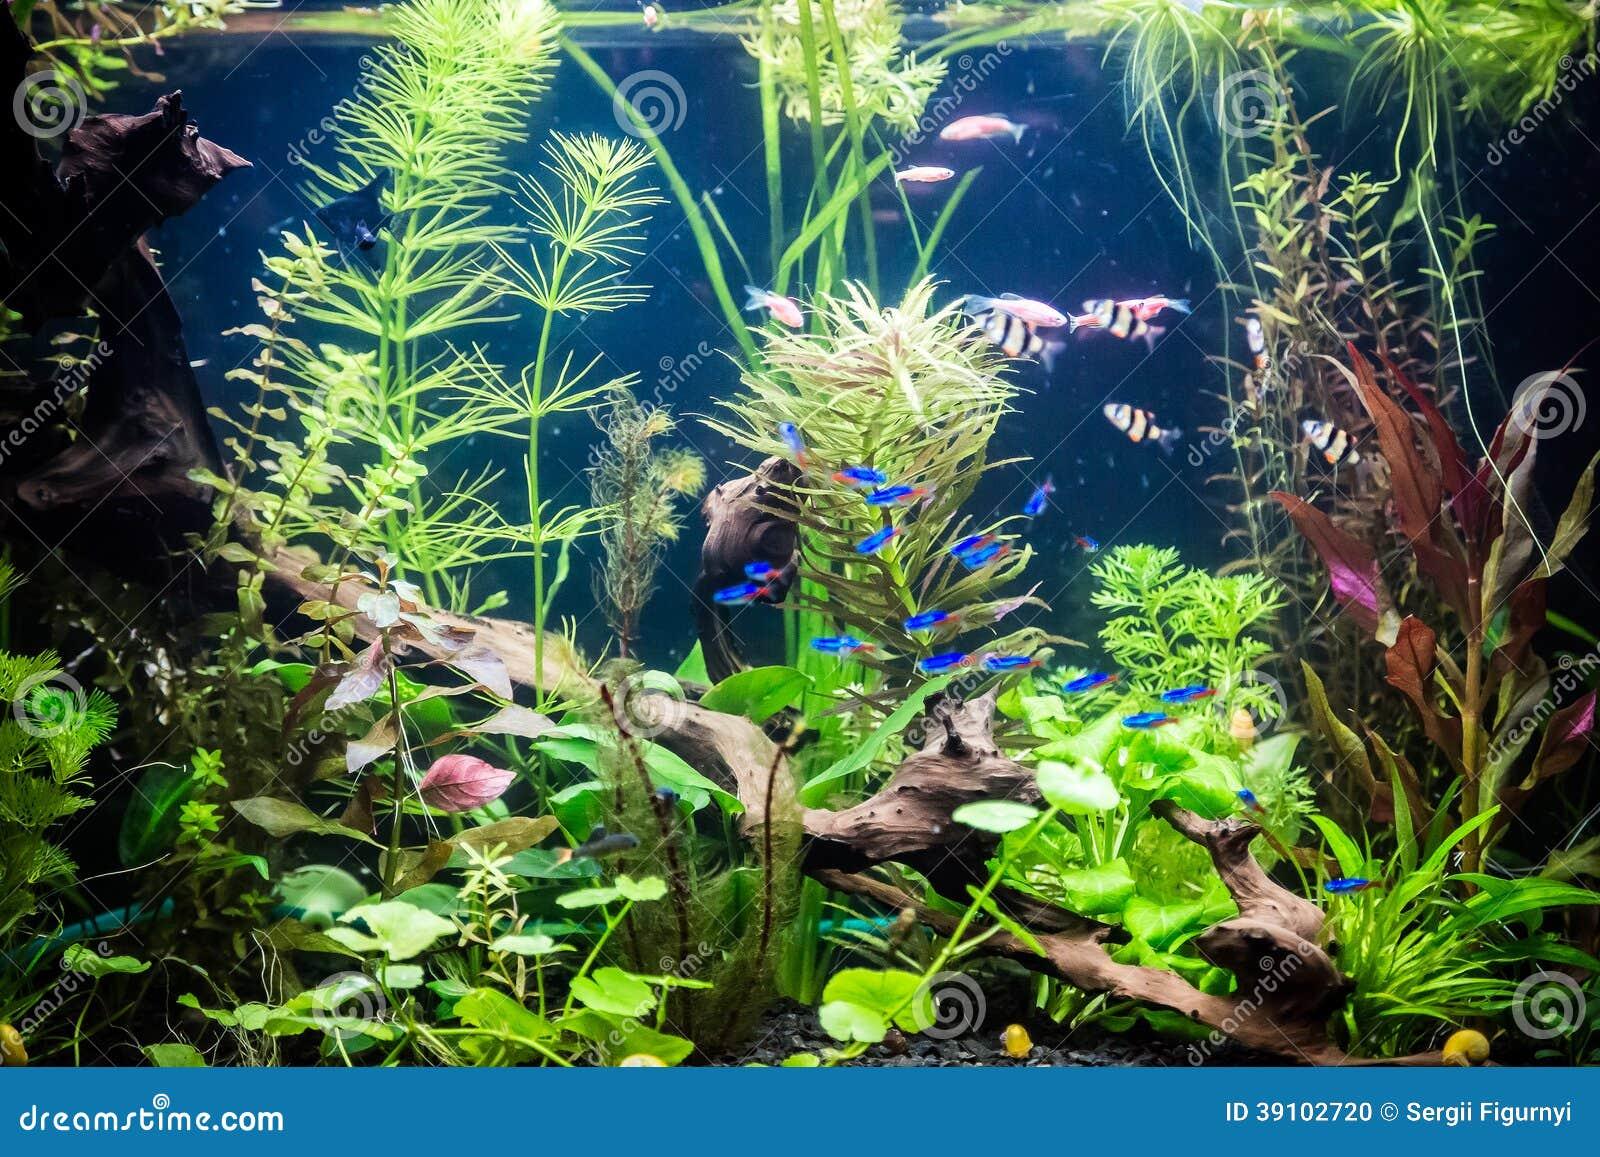 Ttropical zoetwateraquarium met vissen